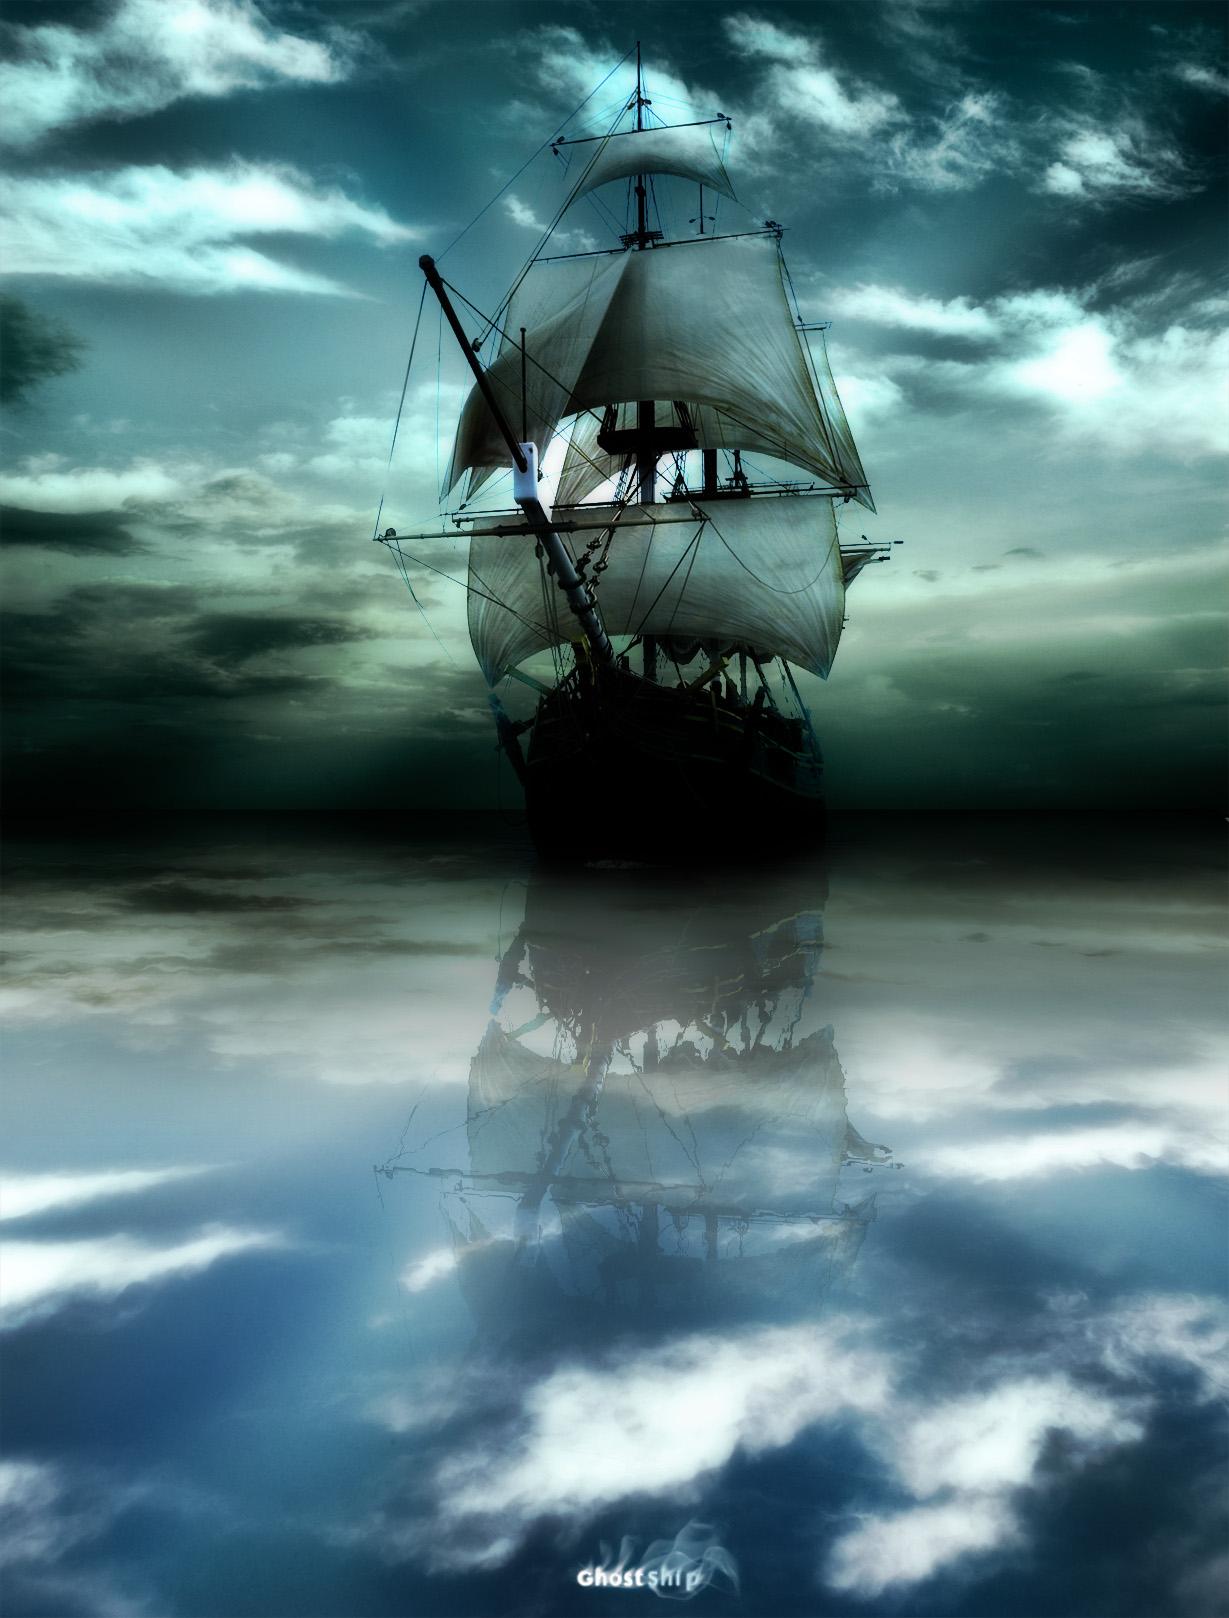 http://fc04.deviantart.net/fs41/f/2009/020/2/e/Ghost_Ship_by_NooA.jpg